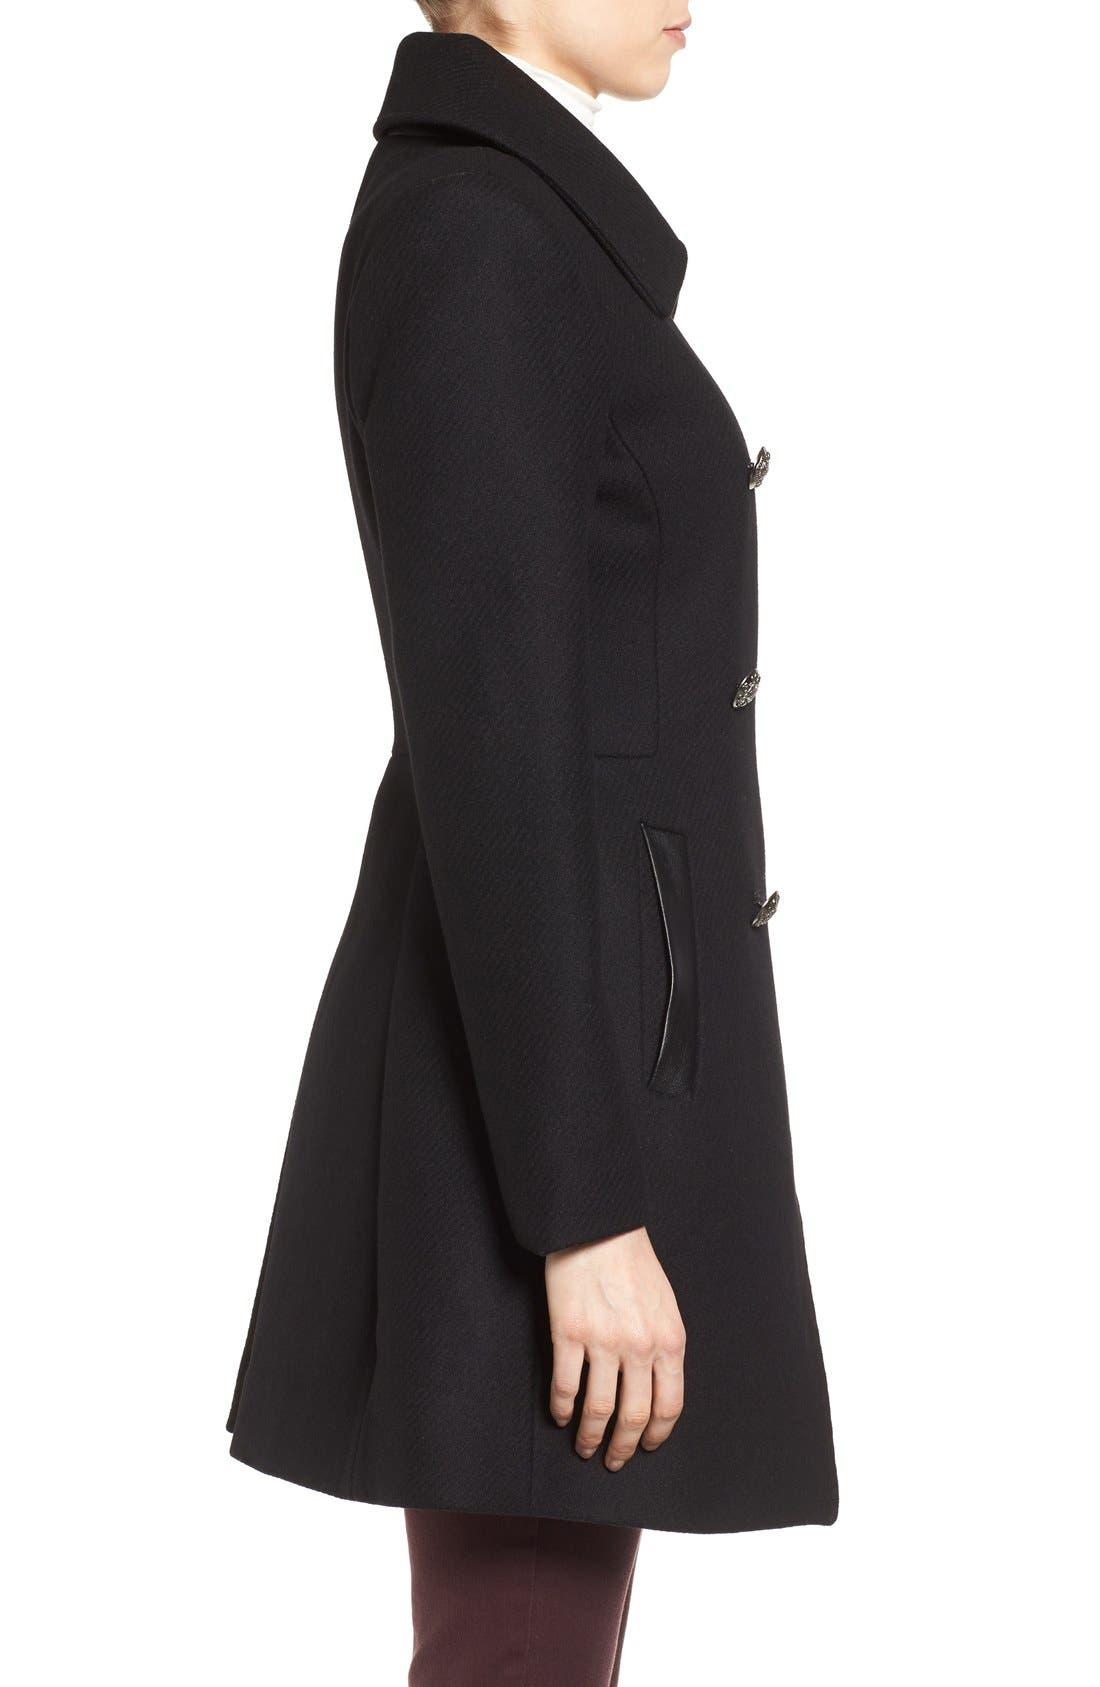 Alternate Image 3  - Trina Turk Wool Blend Military Coat (Regular & Petite)